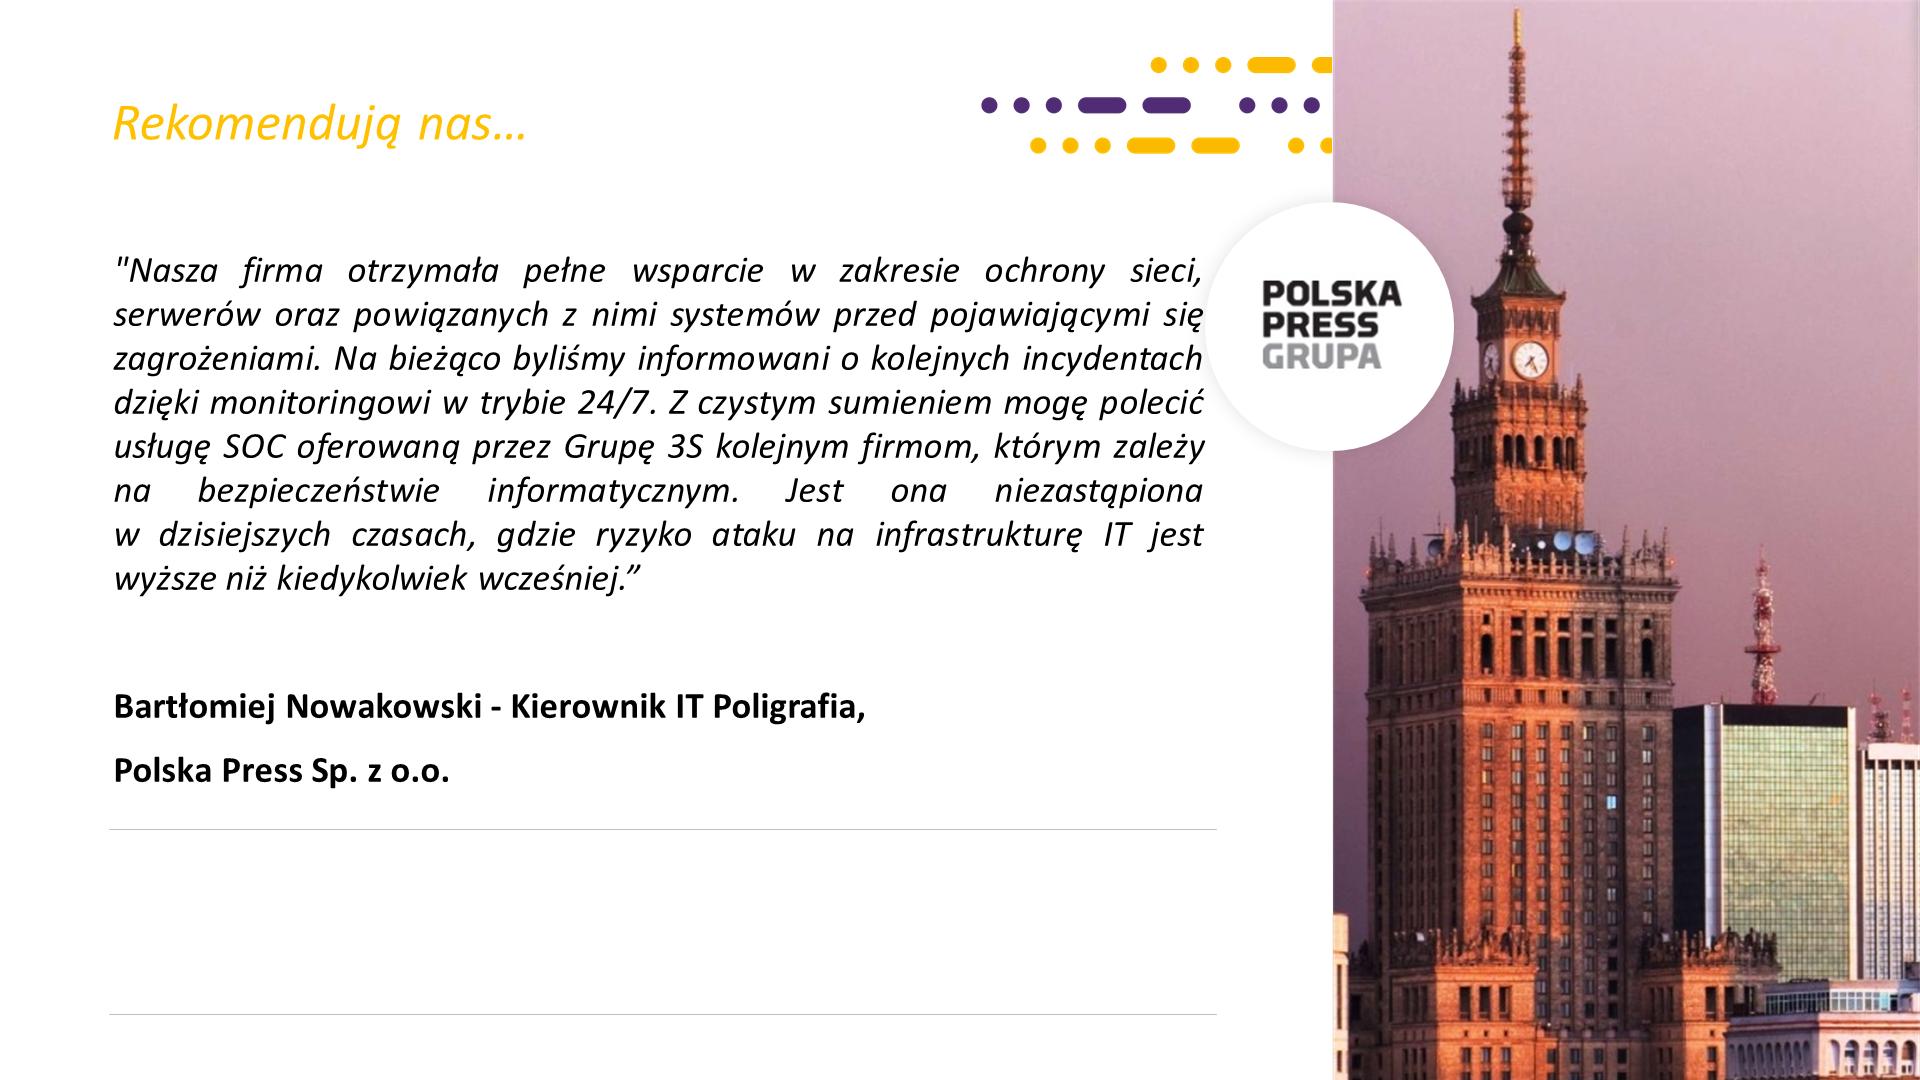 Polska_press